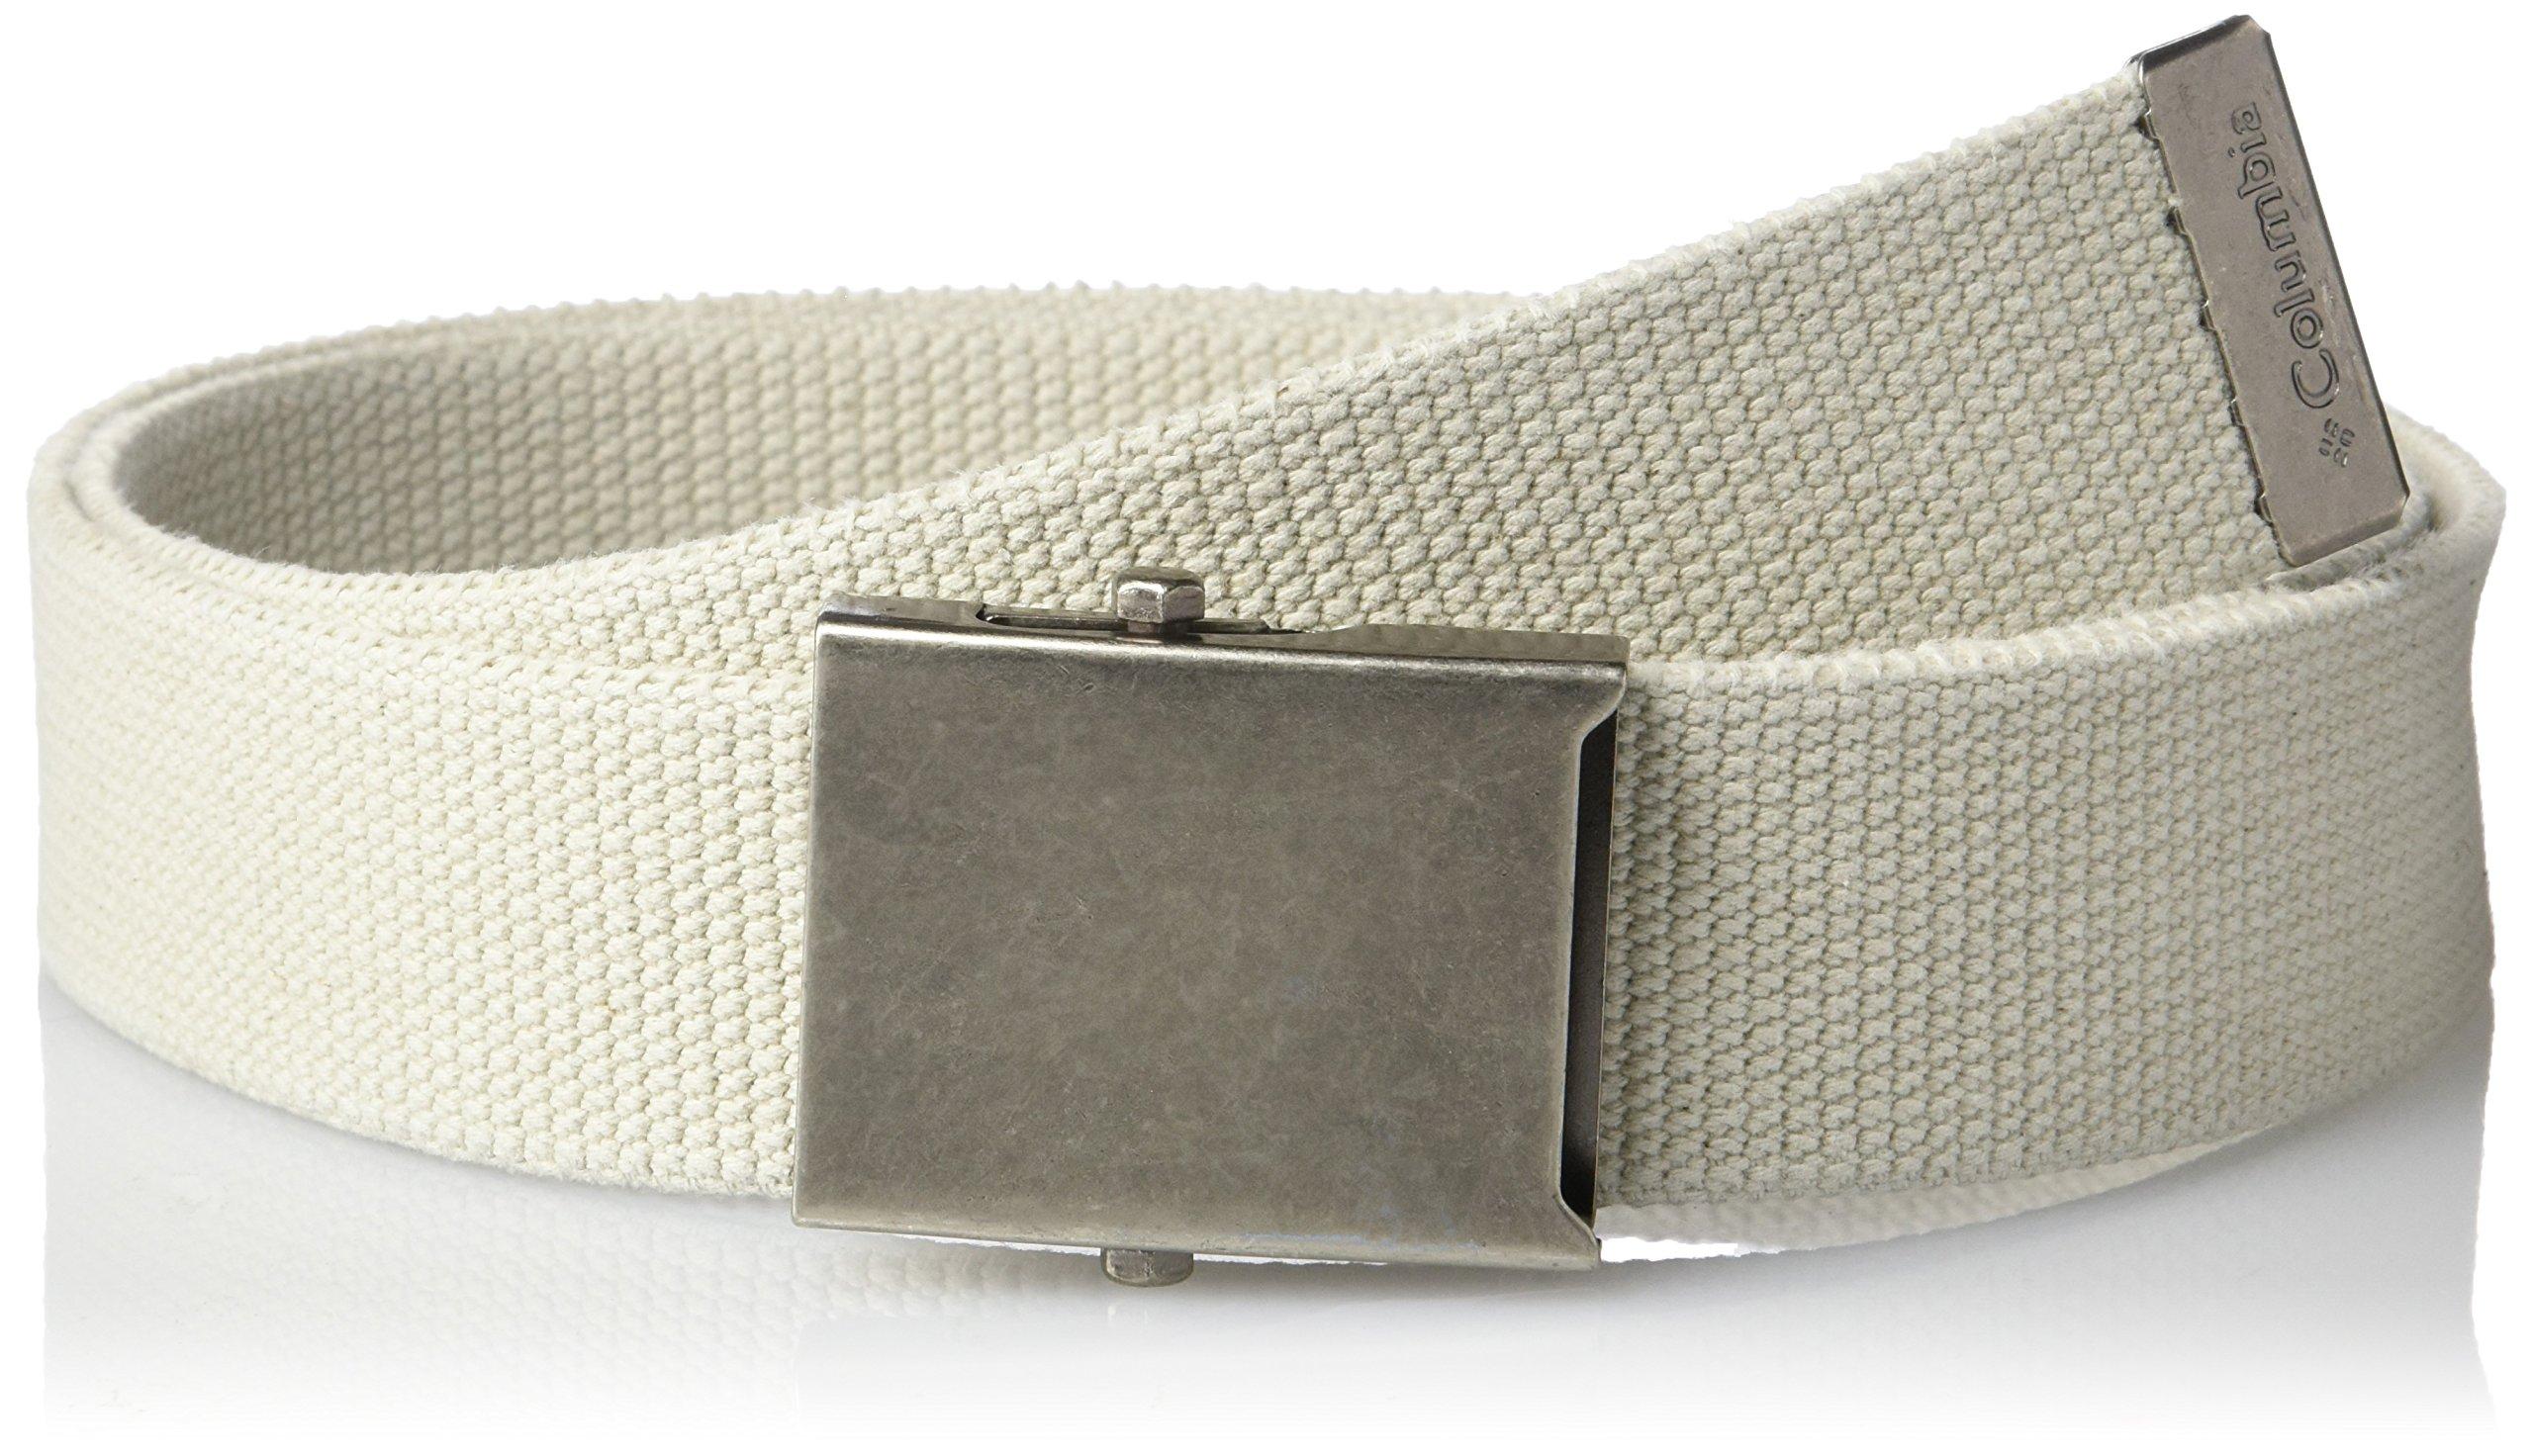 Columbia Men's Military-style Web Belt,Ivory,42